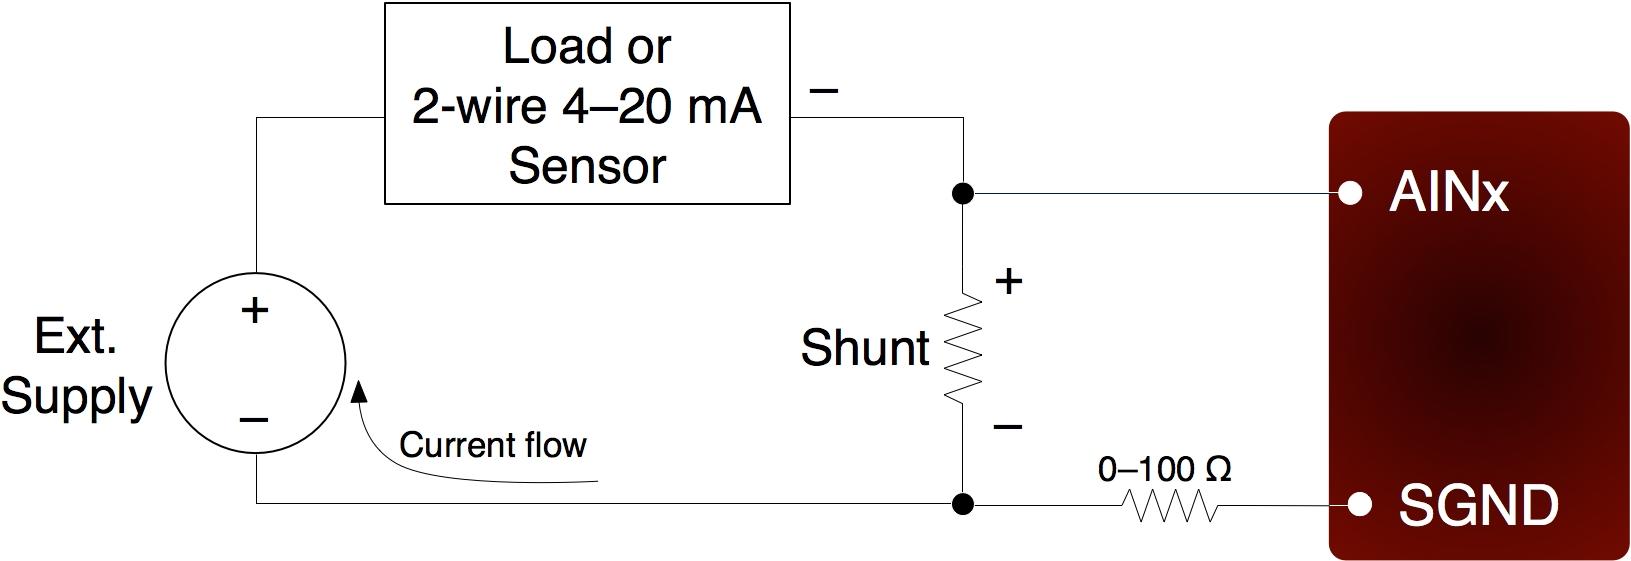 3 Wire Pressure Transducer Wiring Diagram | Free Wiring Diagram  Ma Pressure Sensor Wiring Diagrams on